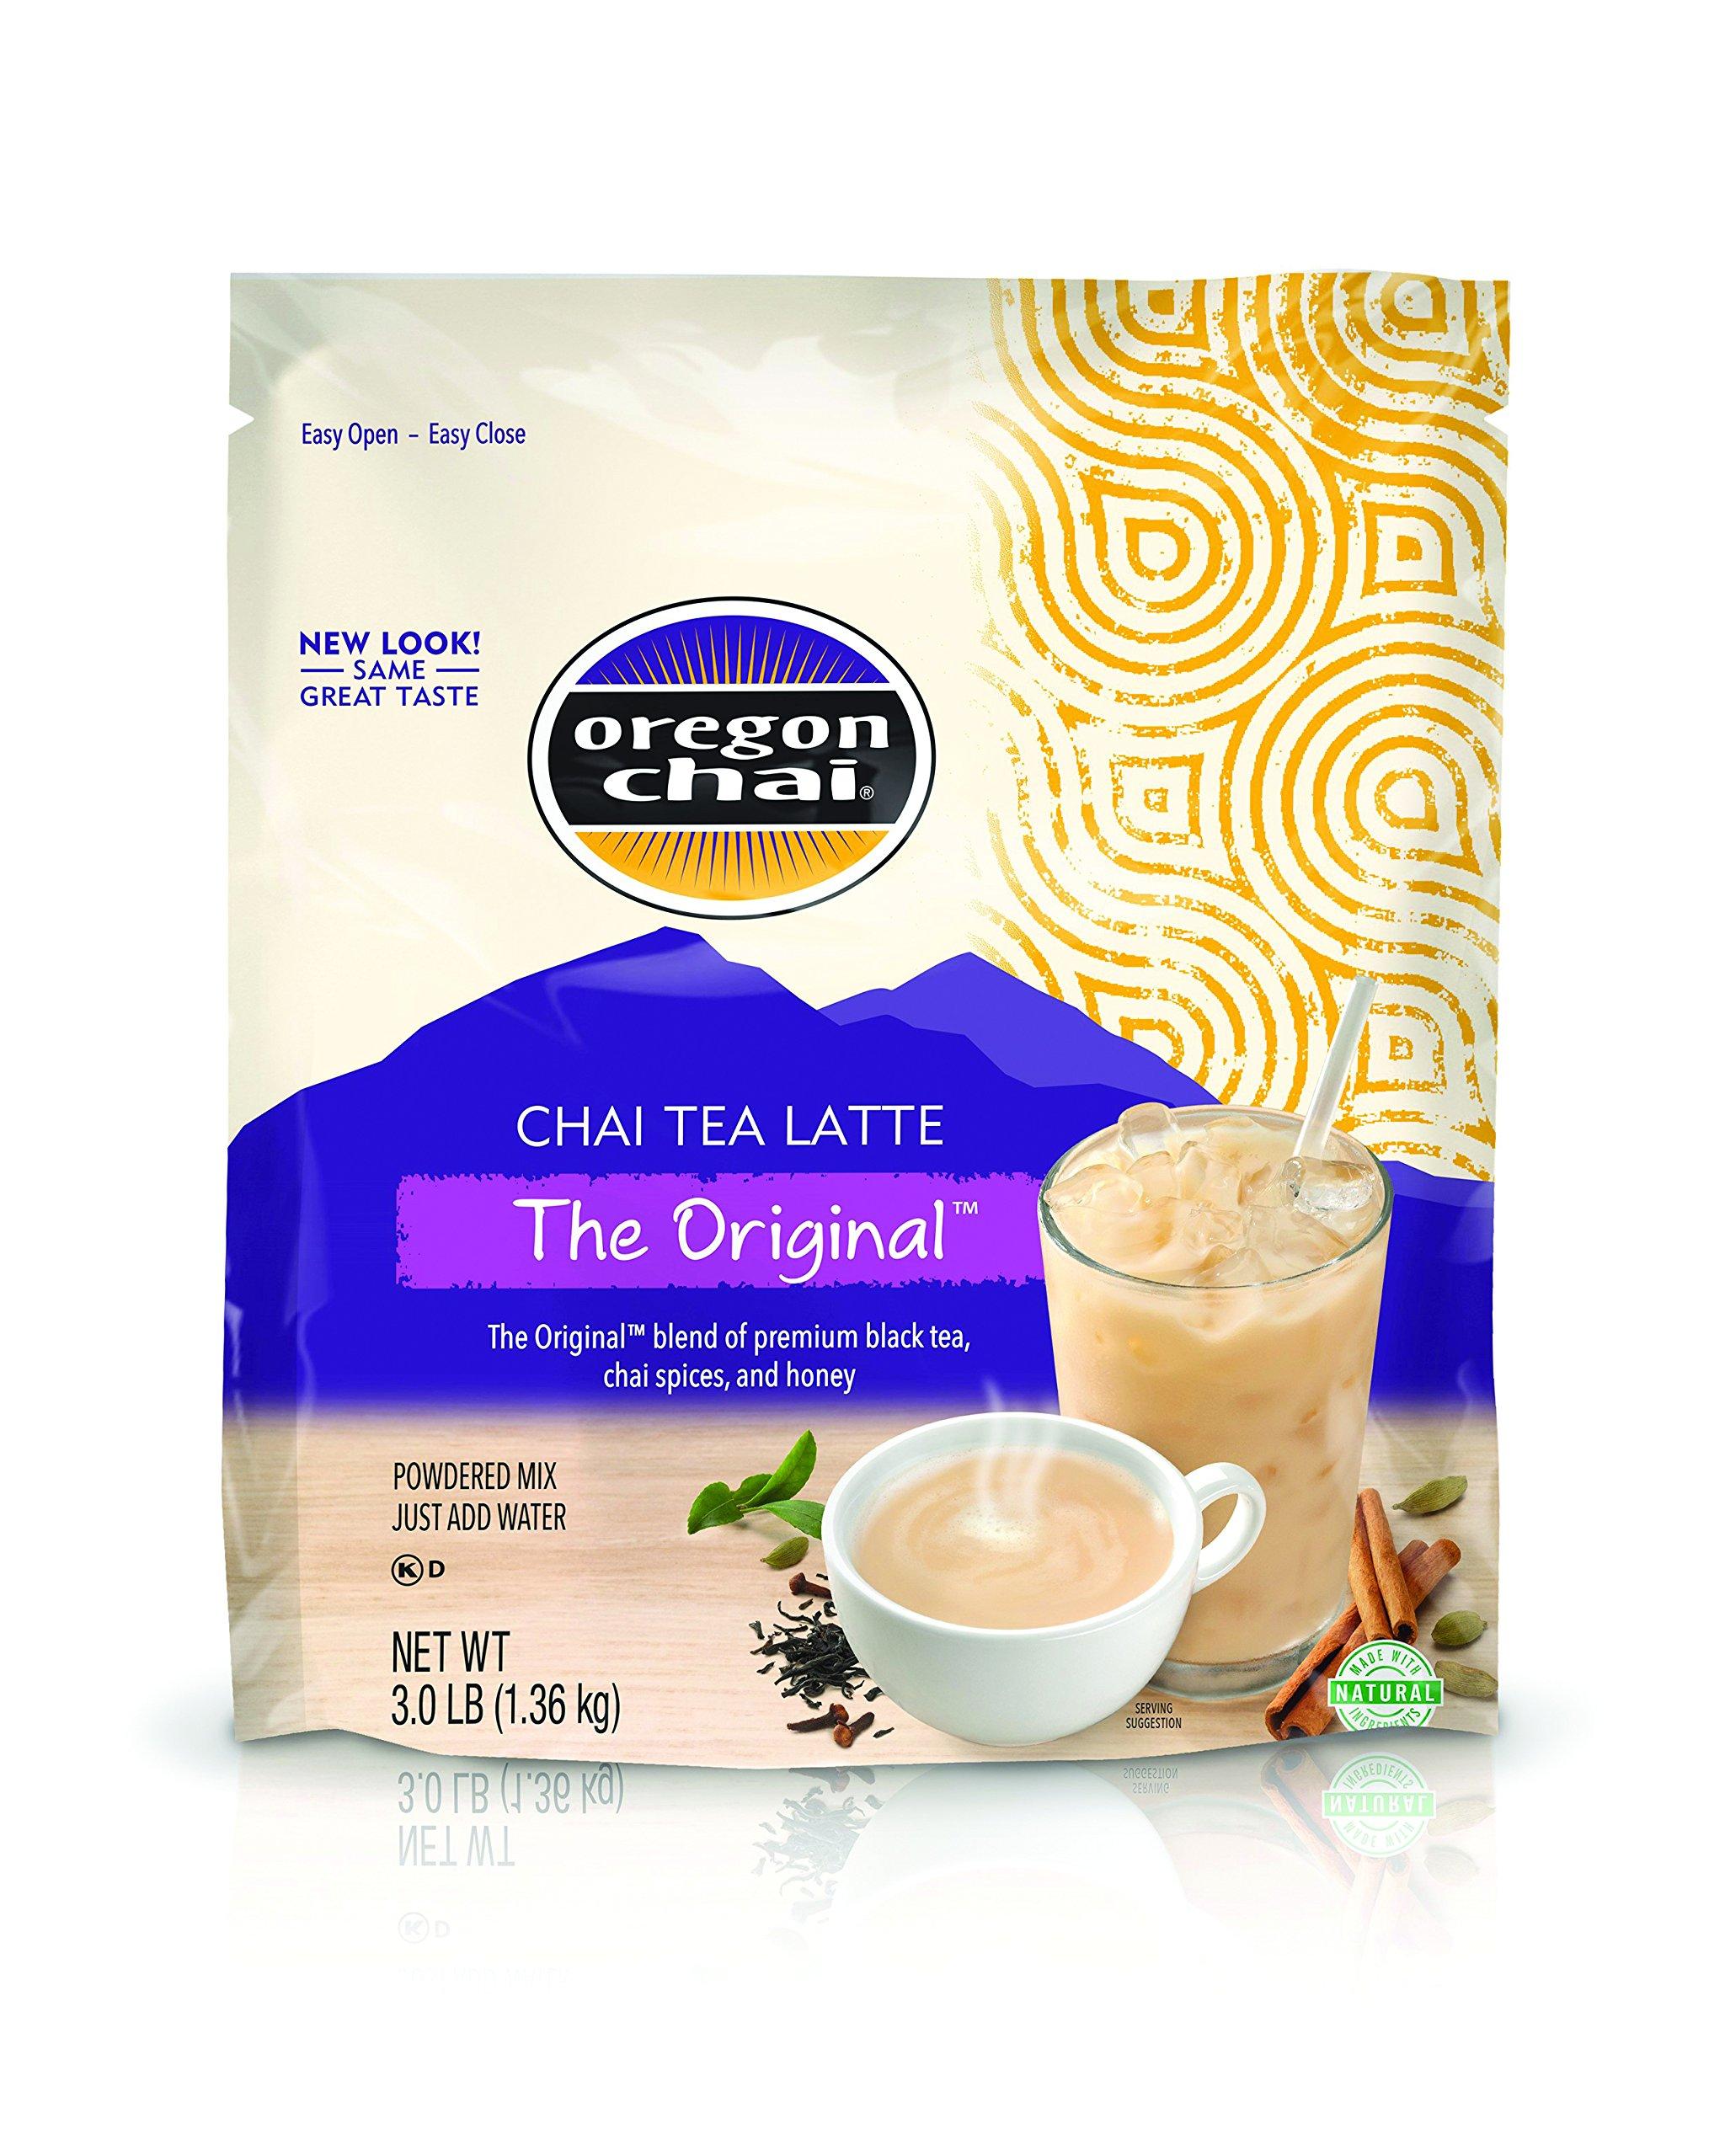 Oregon Chai The Original Chai Tea Latte Mix 3 Pound, Bulk Powdered Spiced Black Tea Latte Mix For Home Use, Café, Food Service